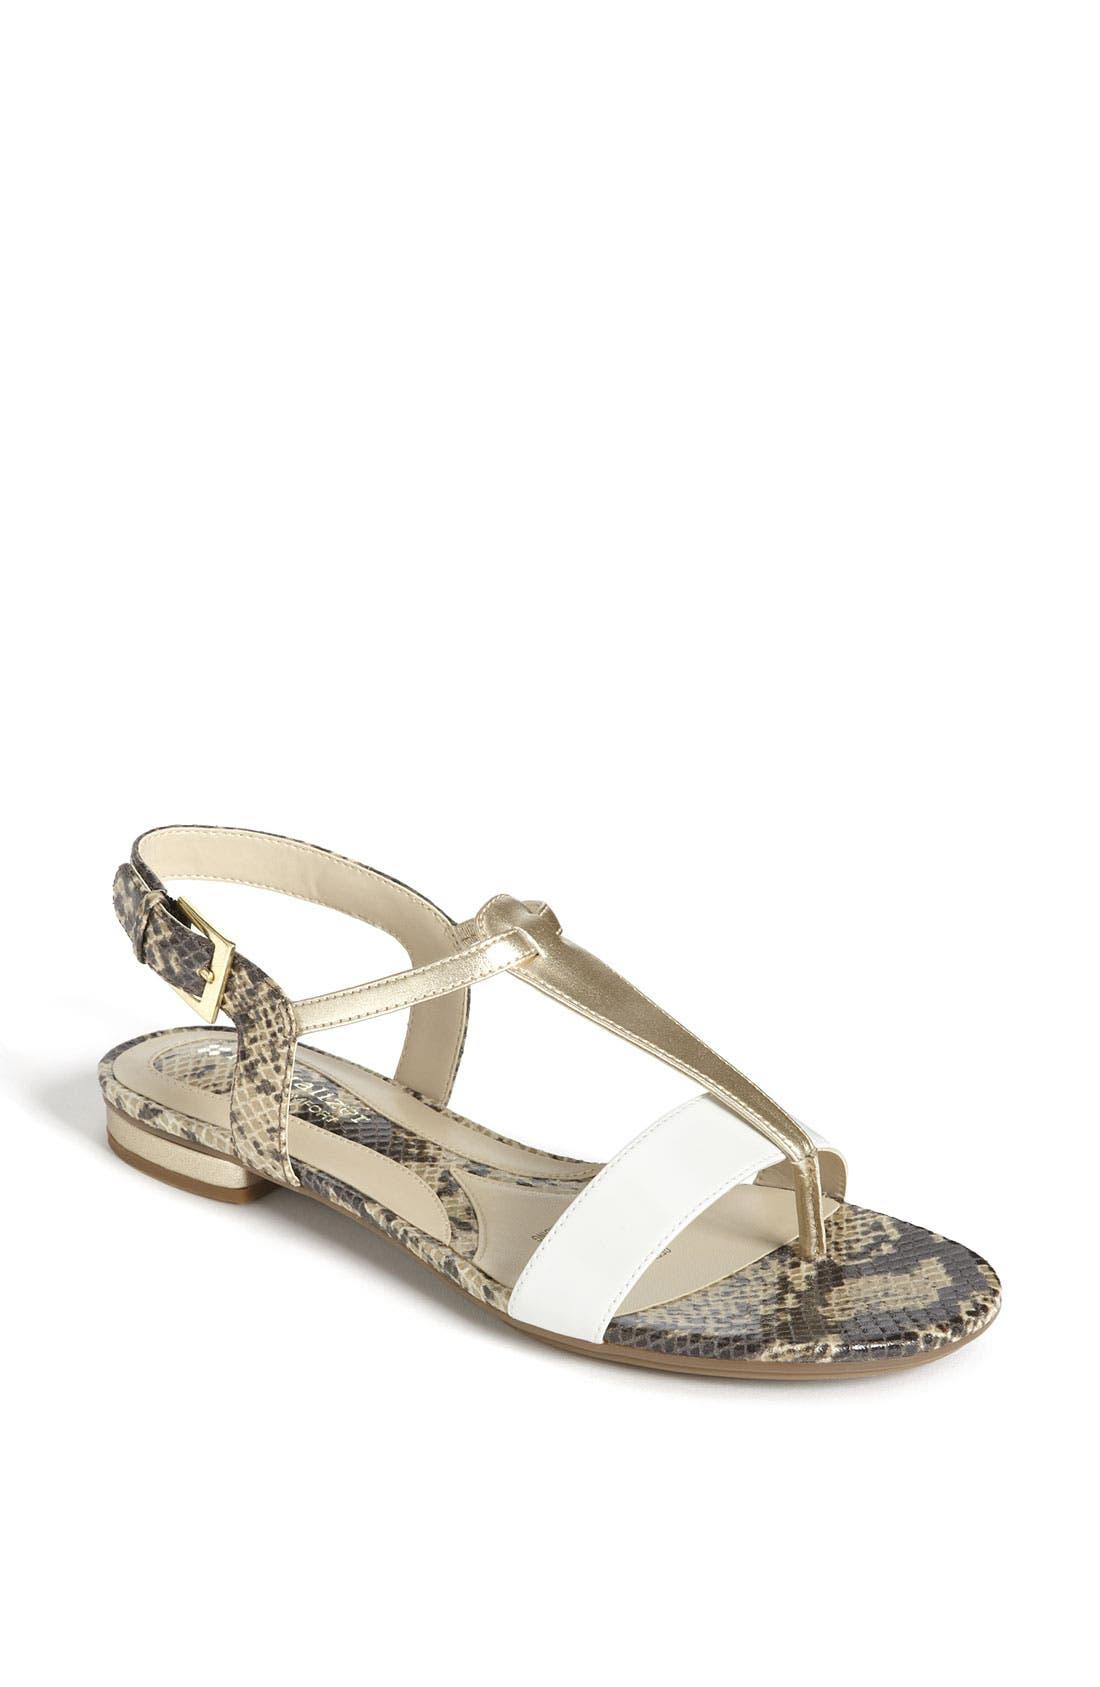 Alternate Image 1 Selected - Naturalizer 'Fira' Sandal